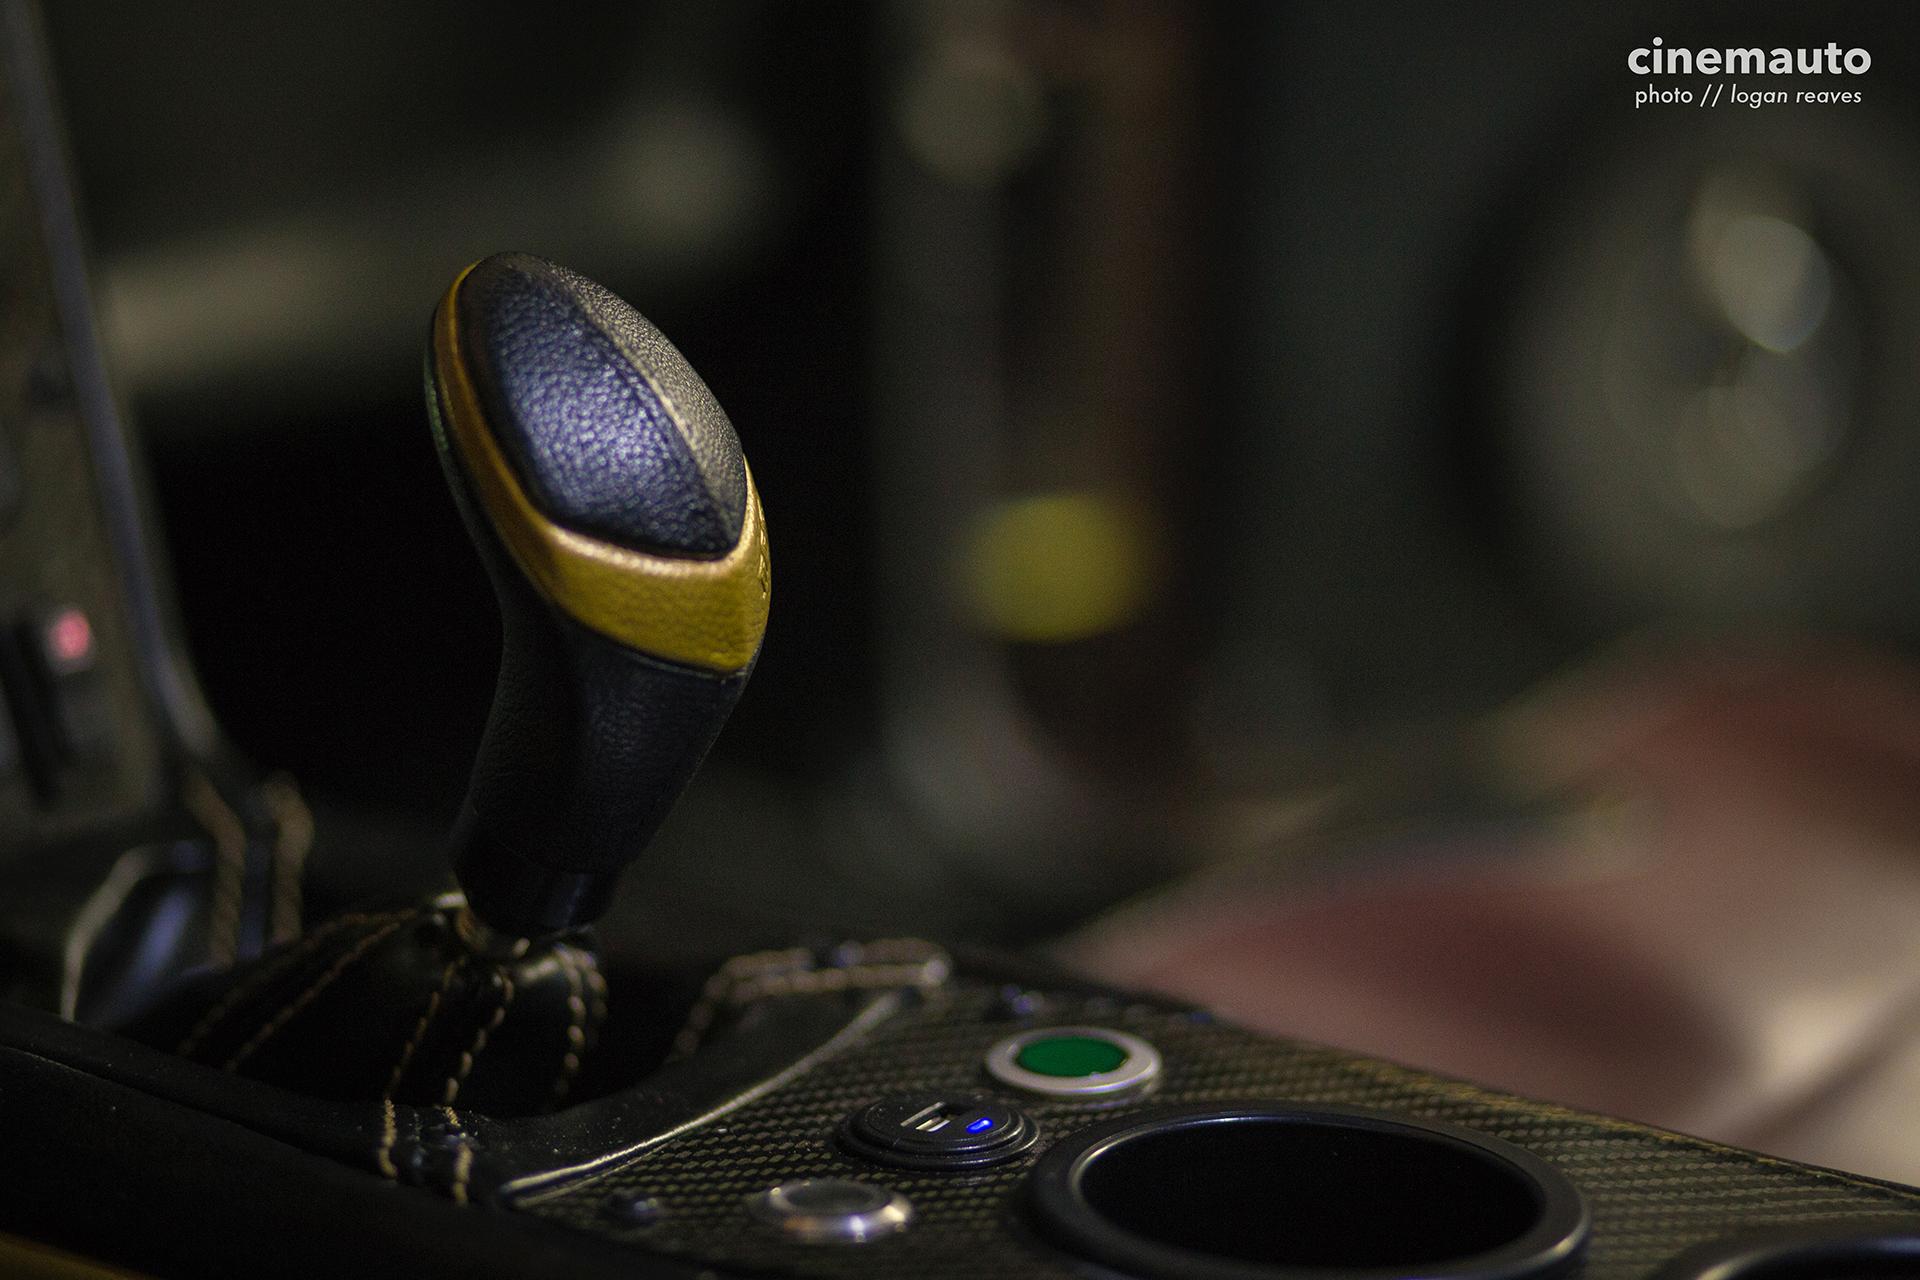 cinemauto-ford-capri-shiftknob.jpg